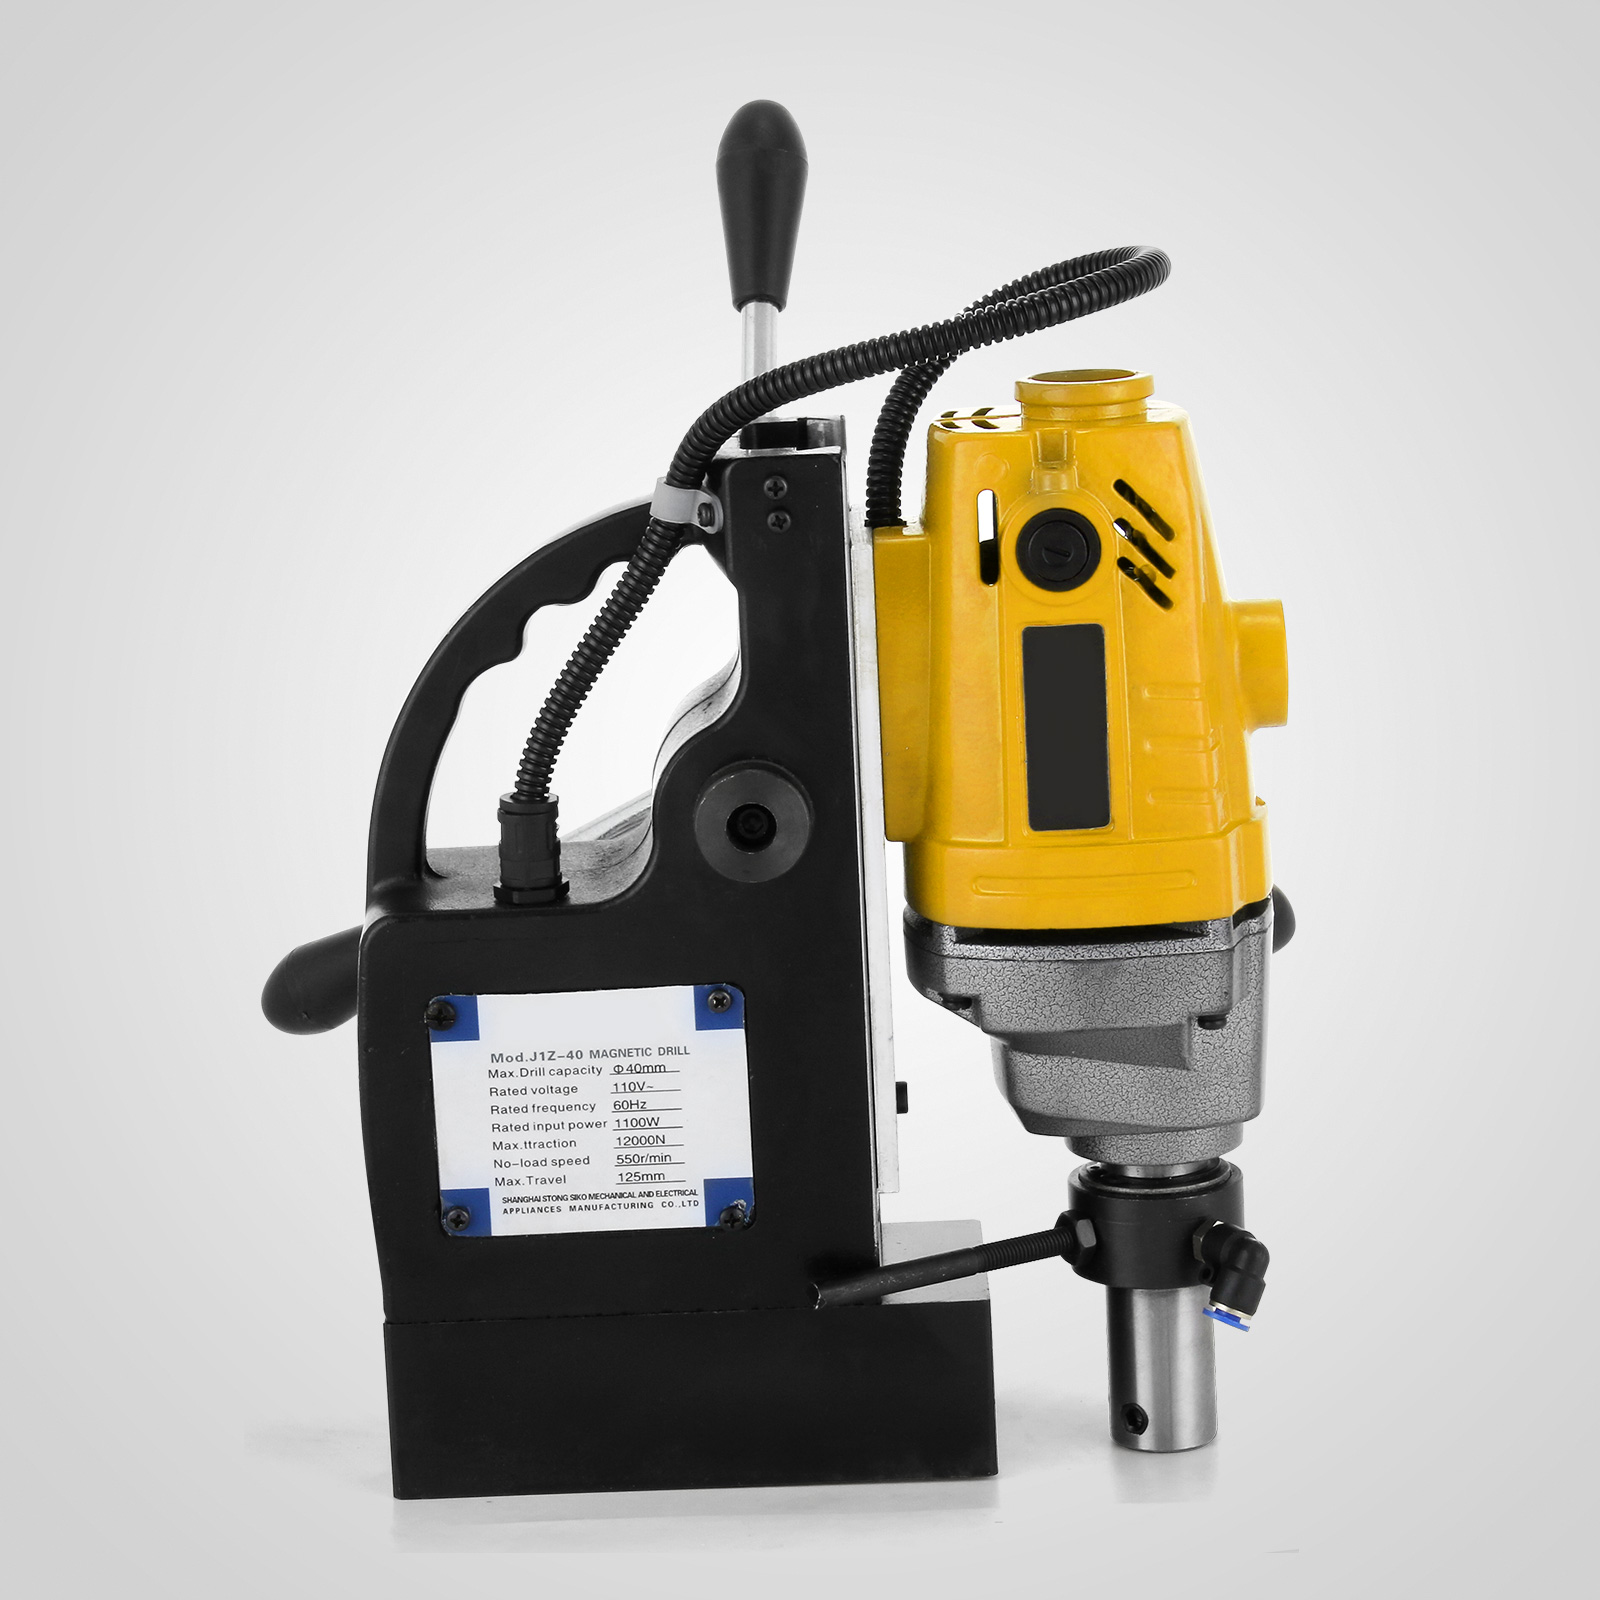 MB23-BRM35-MD40-Trapano-Perforatrice-Carotatore-Fresa-Magnetico-12-40mm-230V miniatura 42